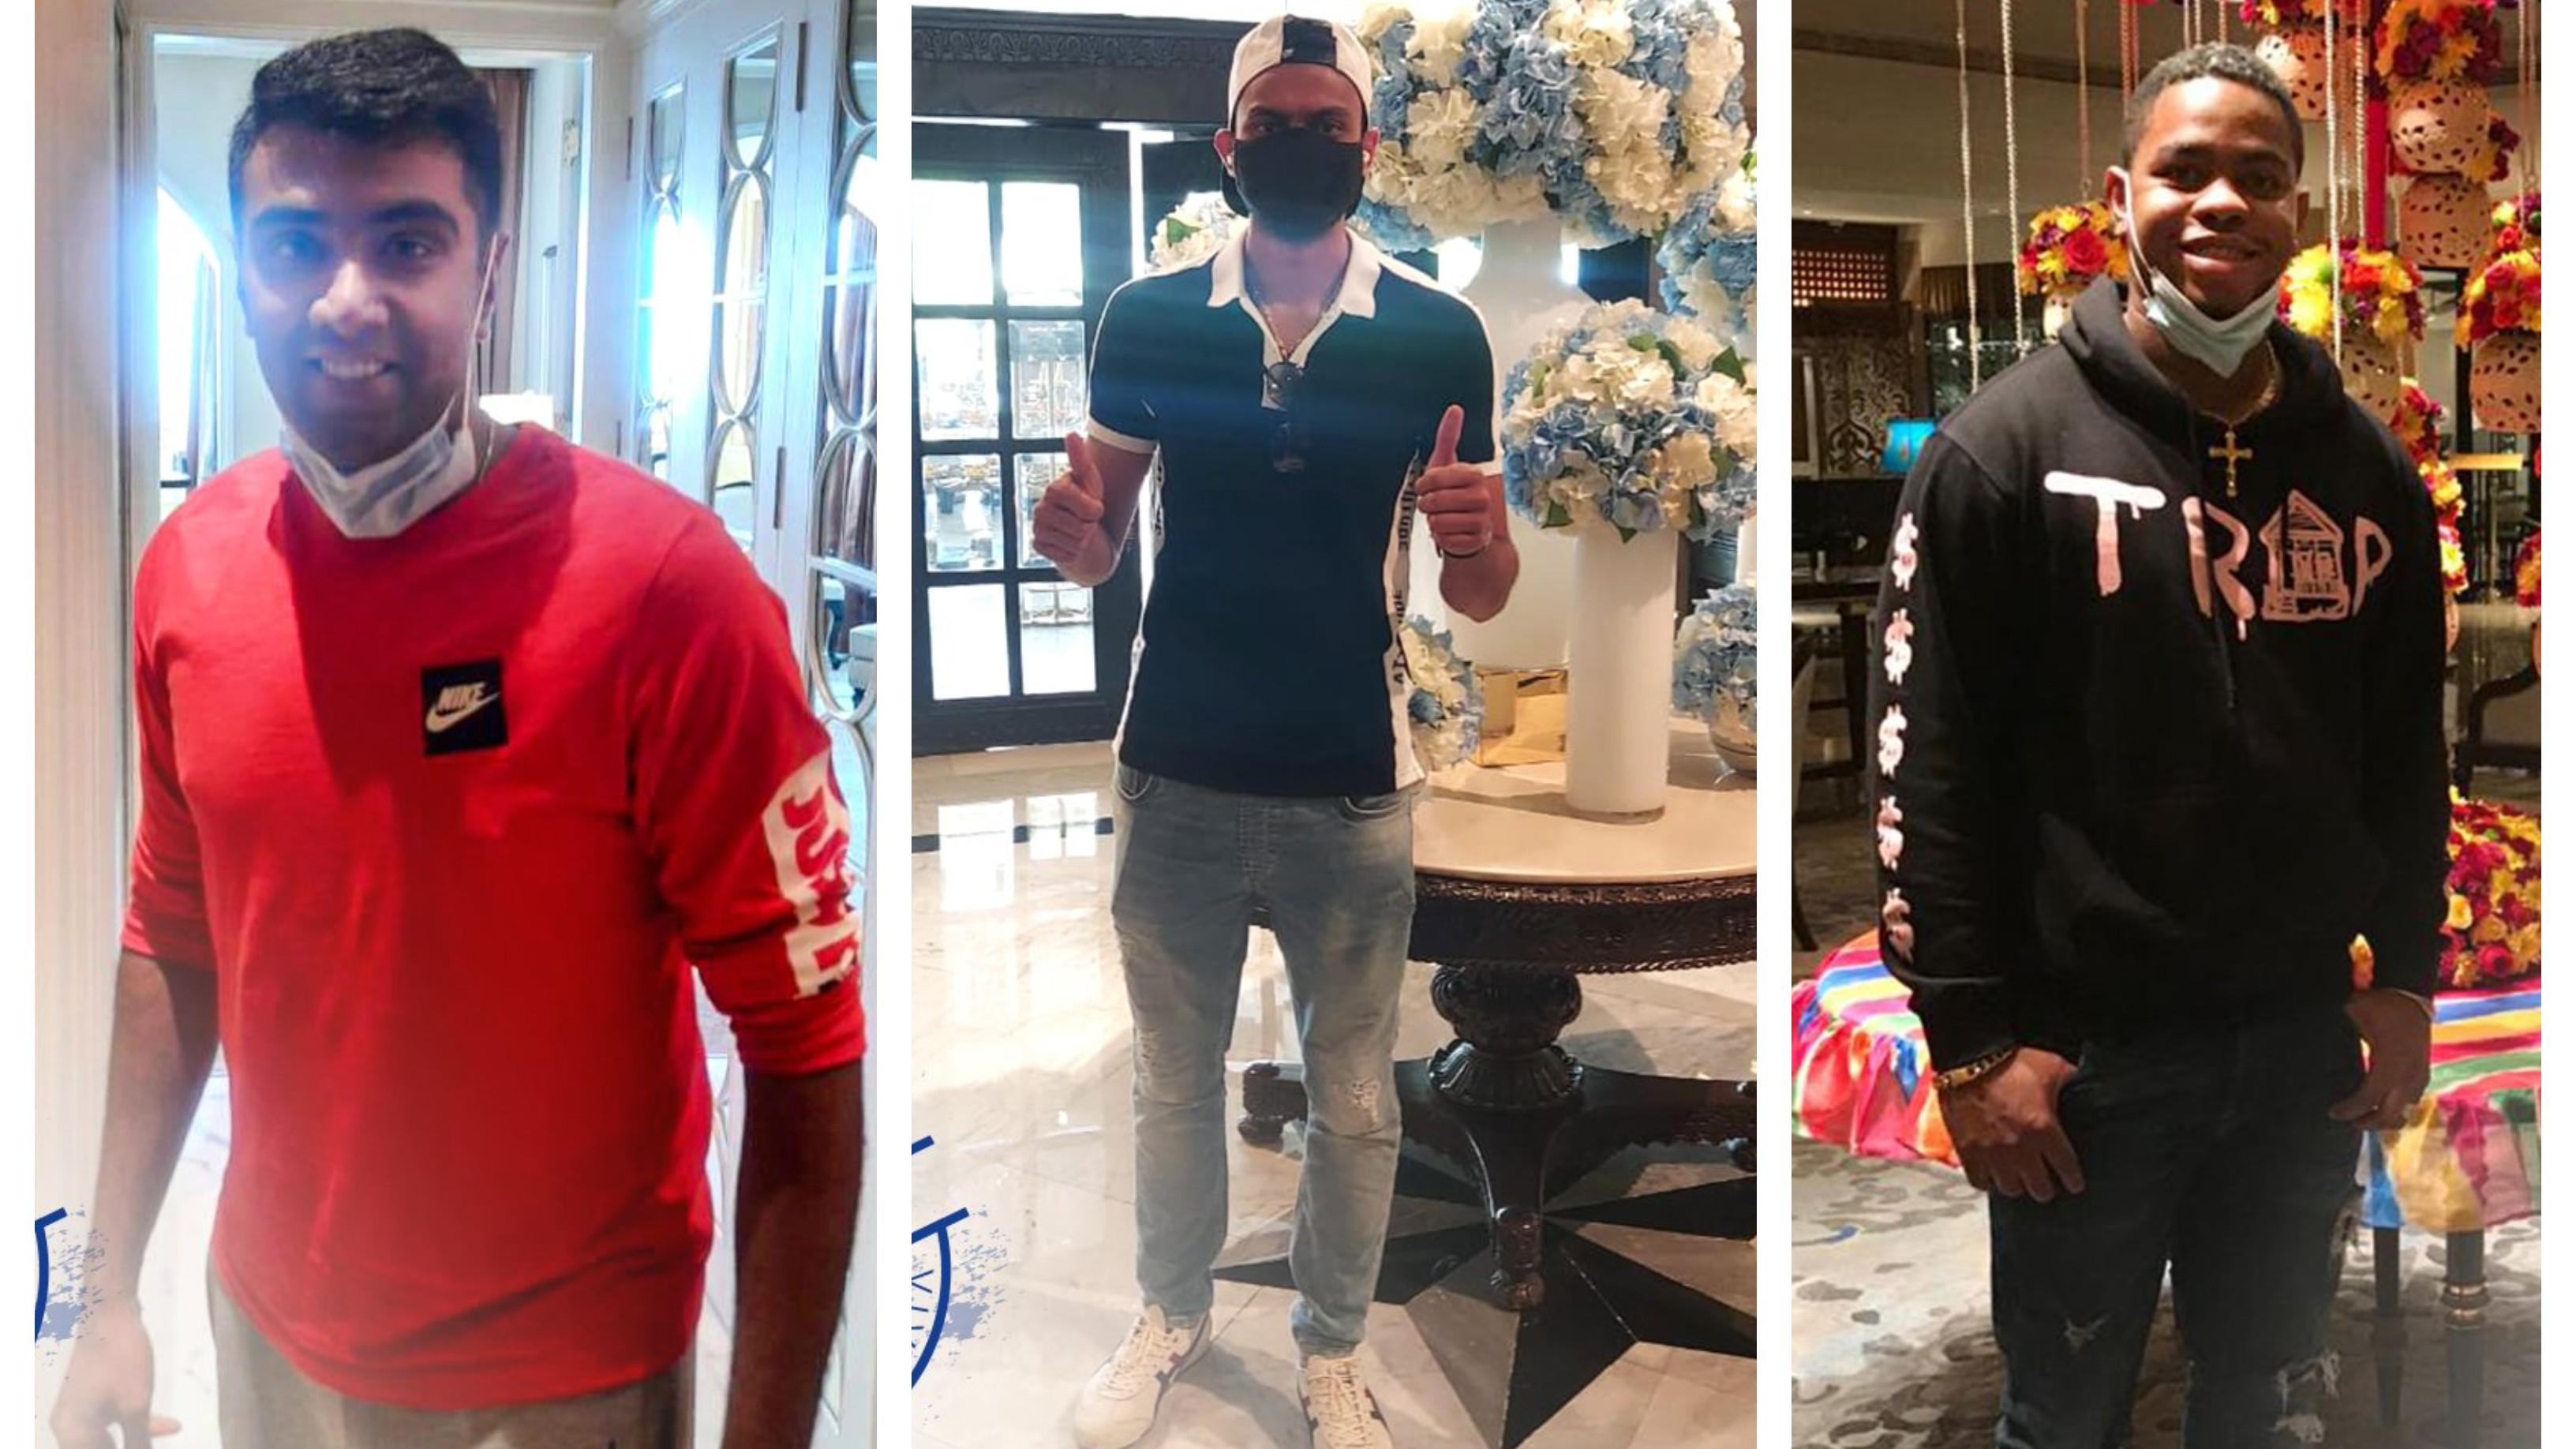 IPL 2021: R Ashwin, Akshar Patel, Shimron Hetmyer gather at Delhi Capitals' team hotel for upcoming IPL